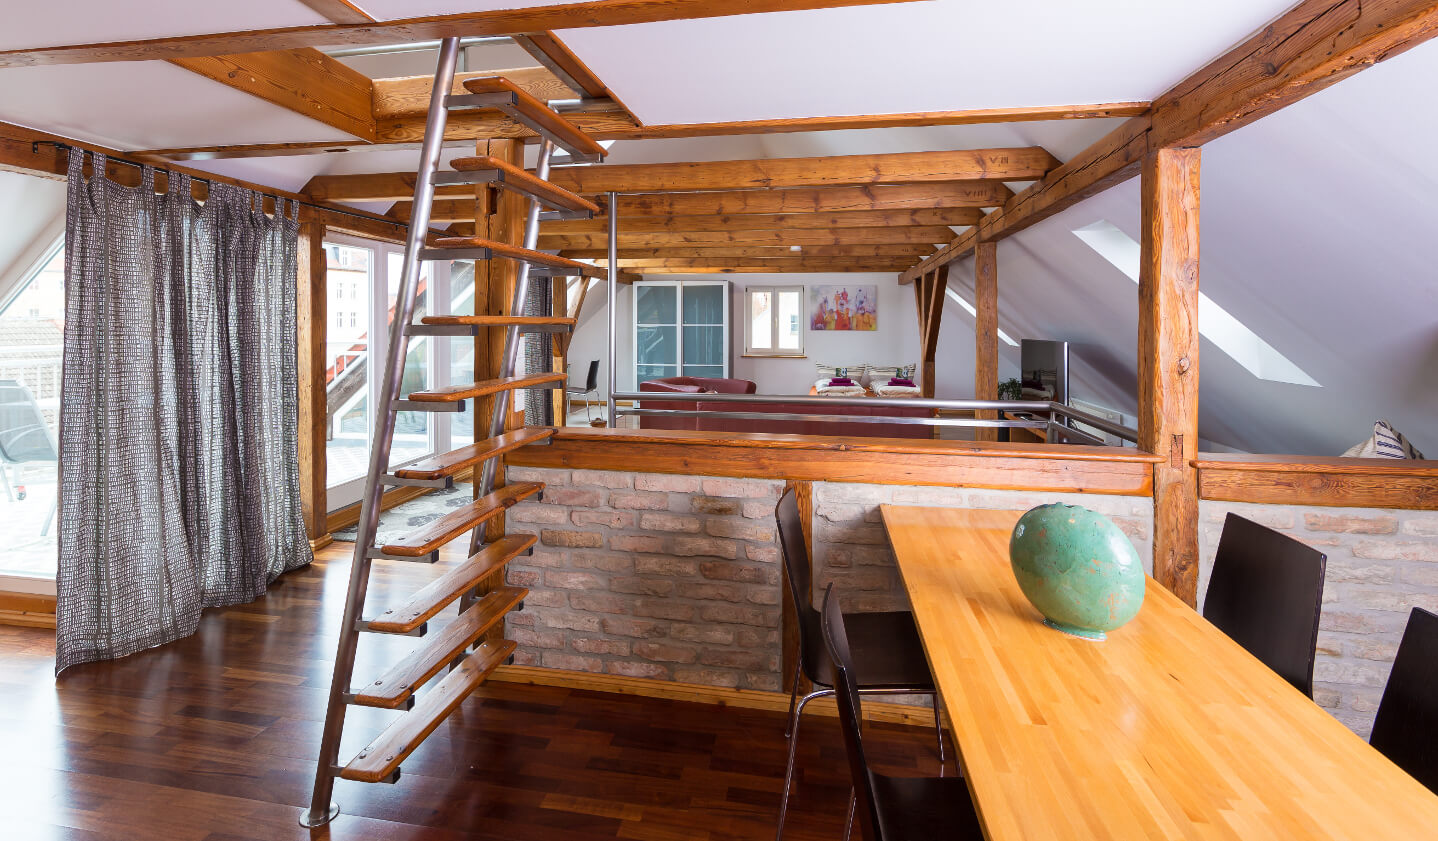 fewo angerapartment loft esstisch 01 angerapartment. Black Bedroom Furniture Sets. Home Design Ideas